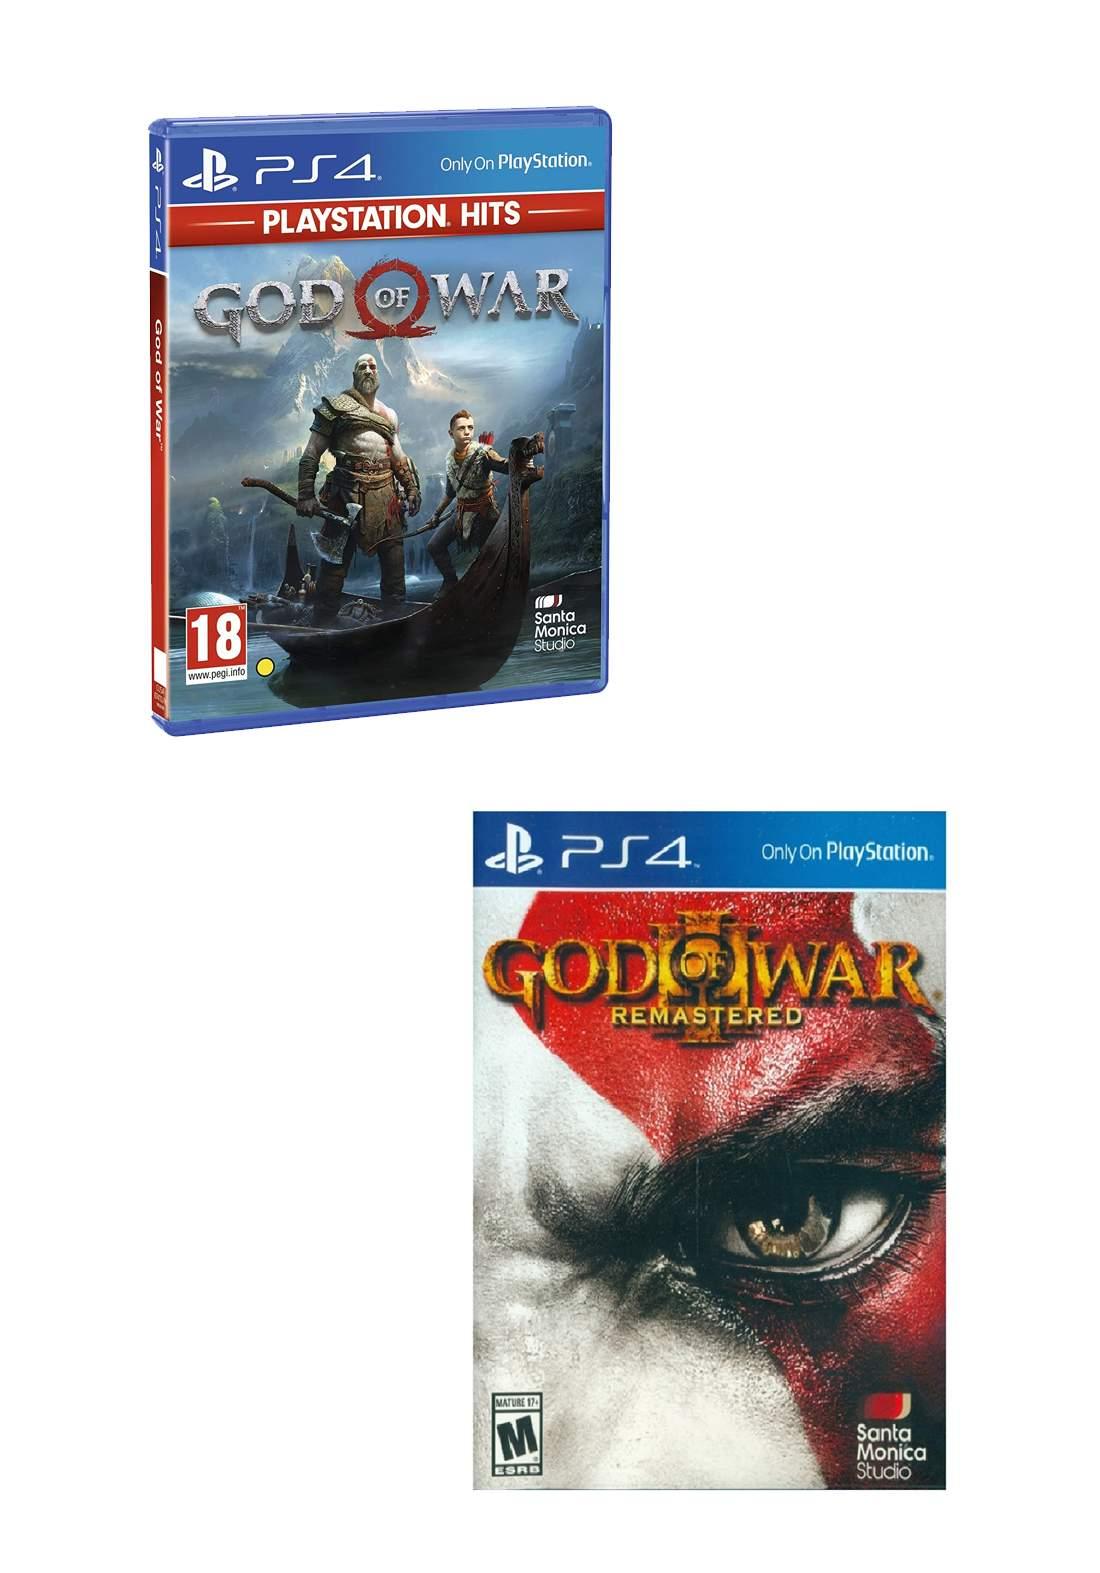 Set of God of War 4 PS4  & God of War 3 PS4  بكج العاب بلاستيشن فور